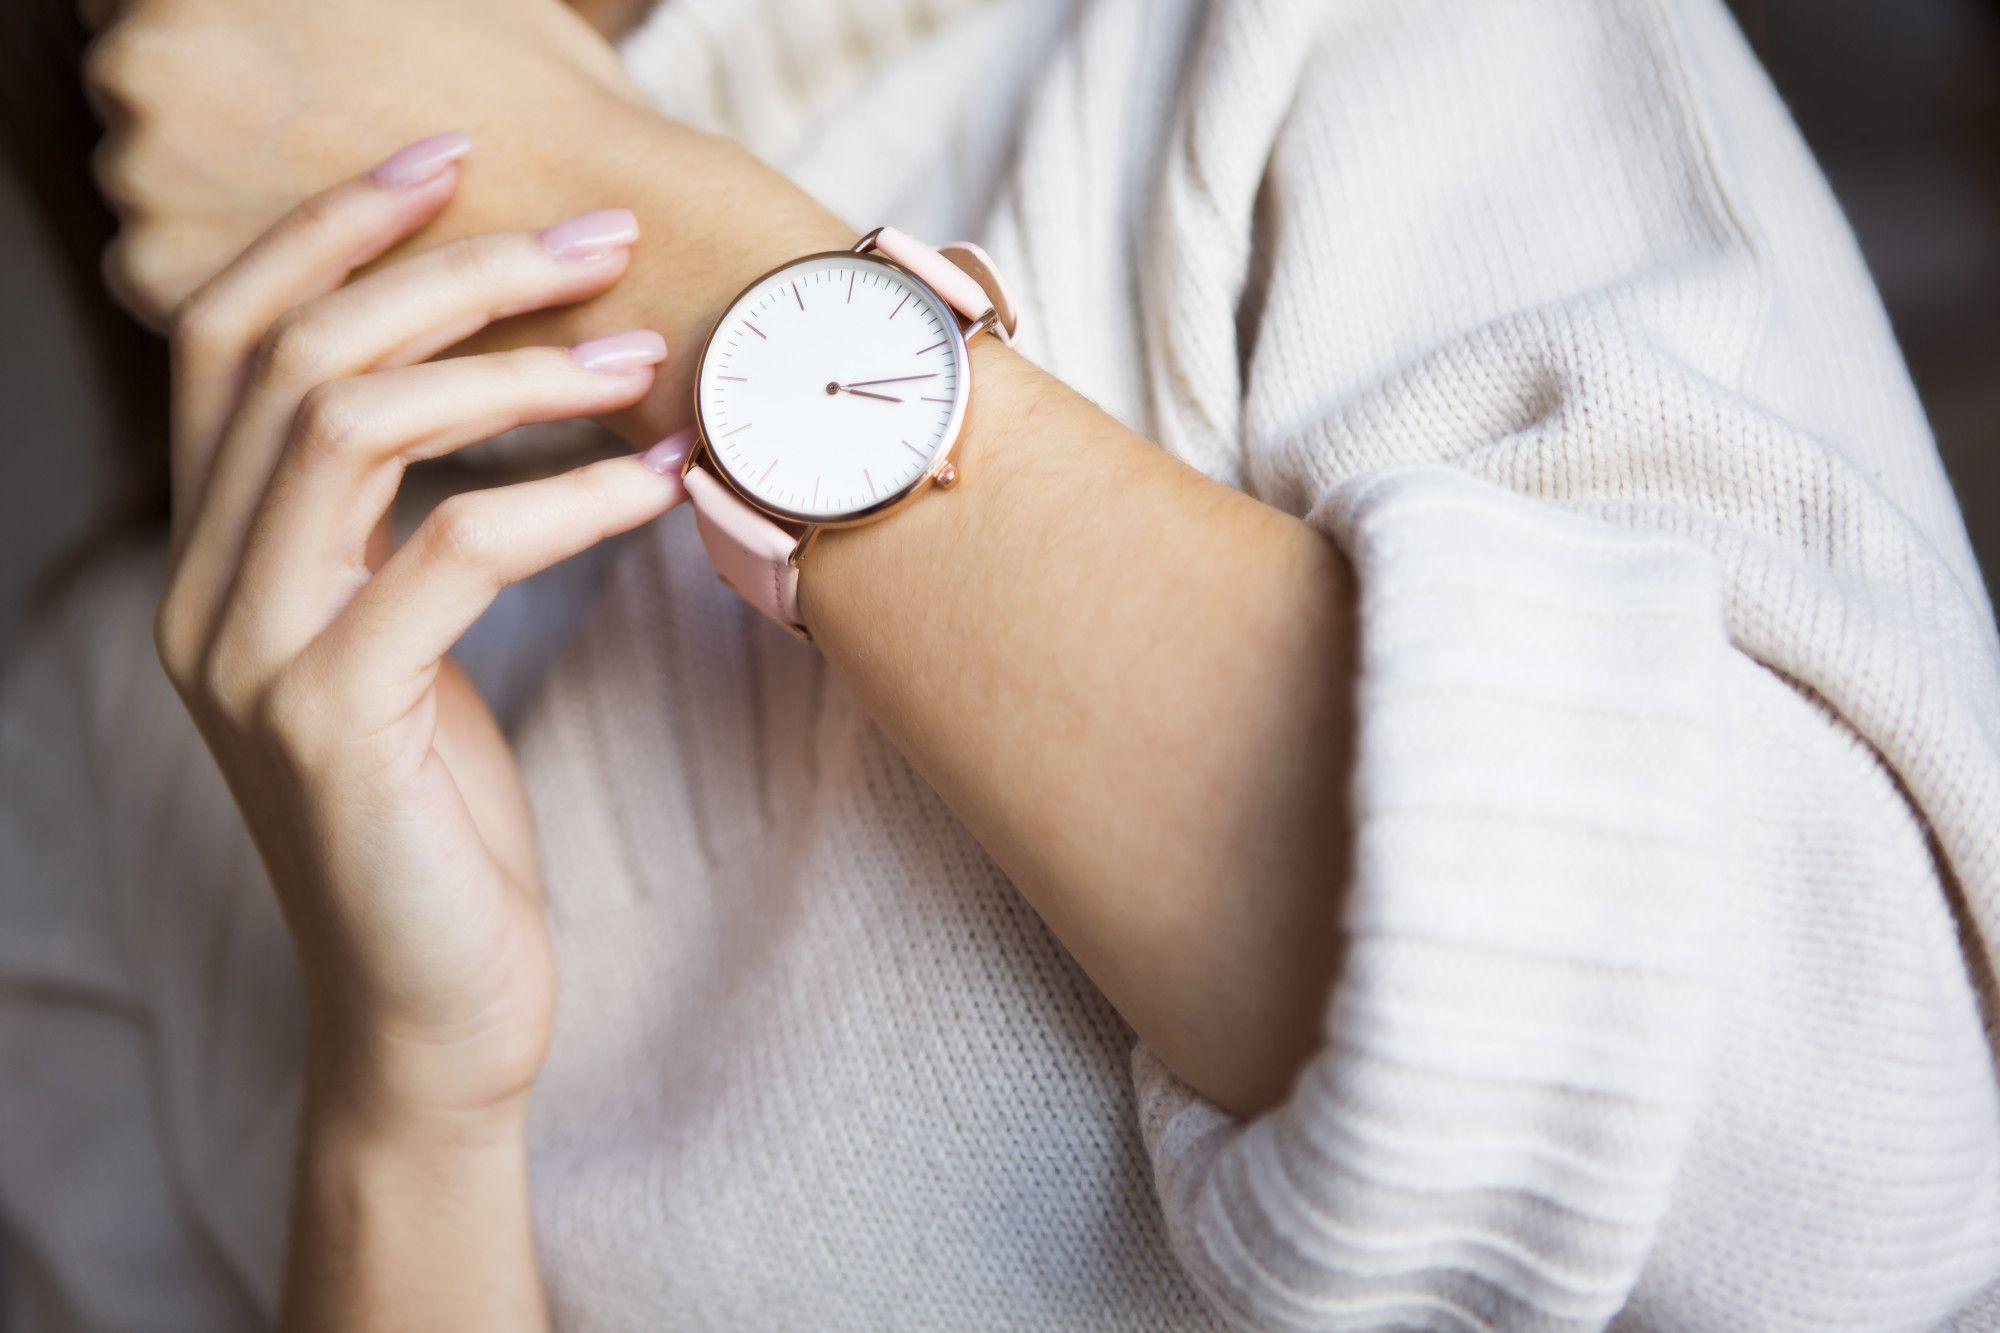 1. Apple Watch Series 4 with Pink Sand Sport Loop